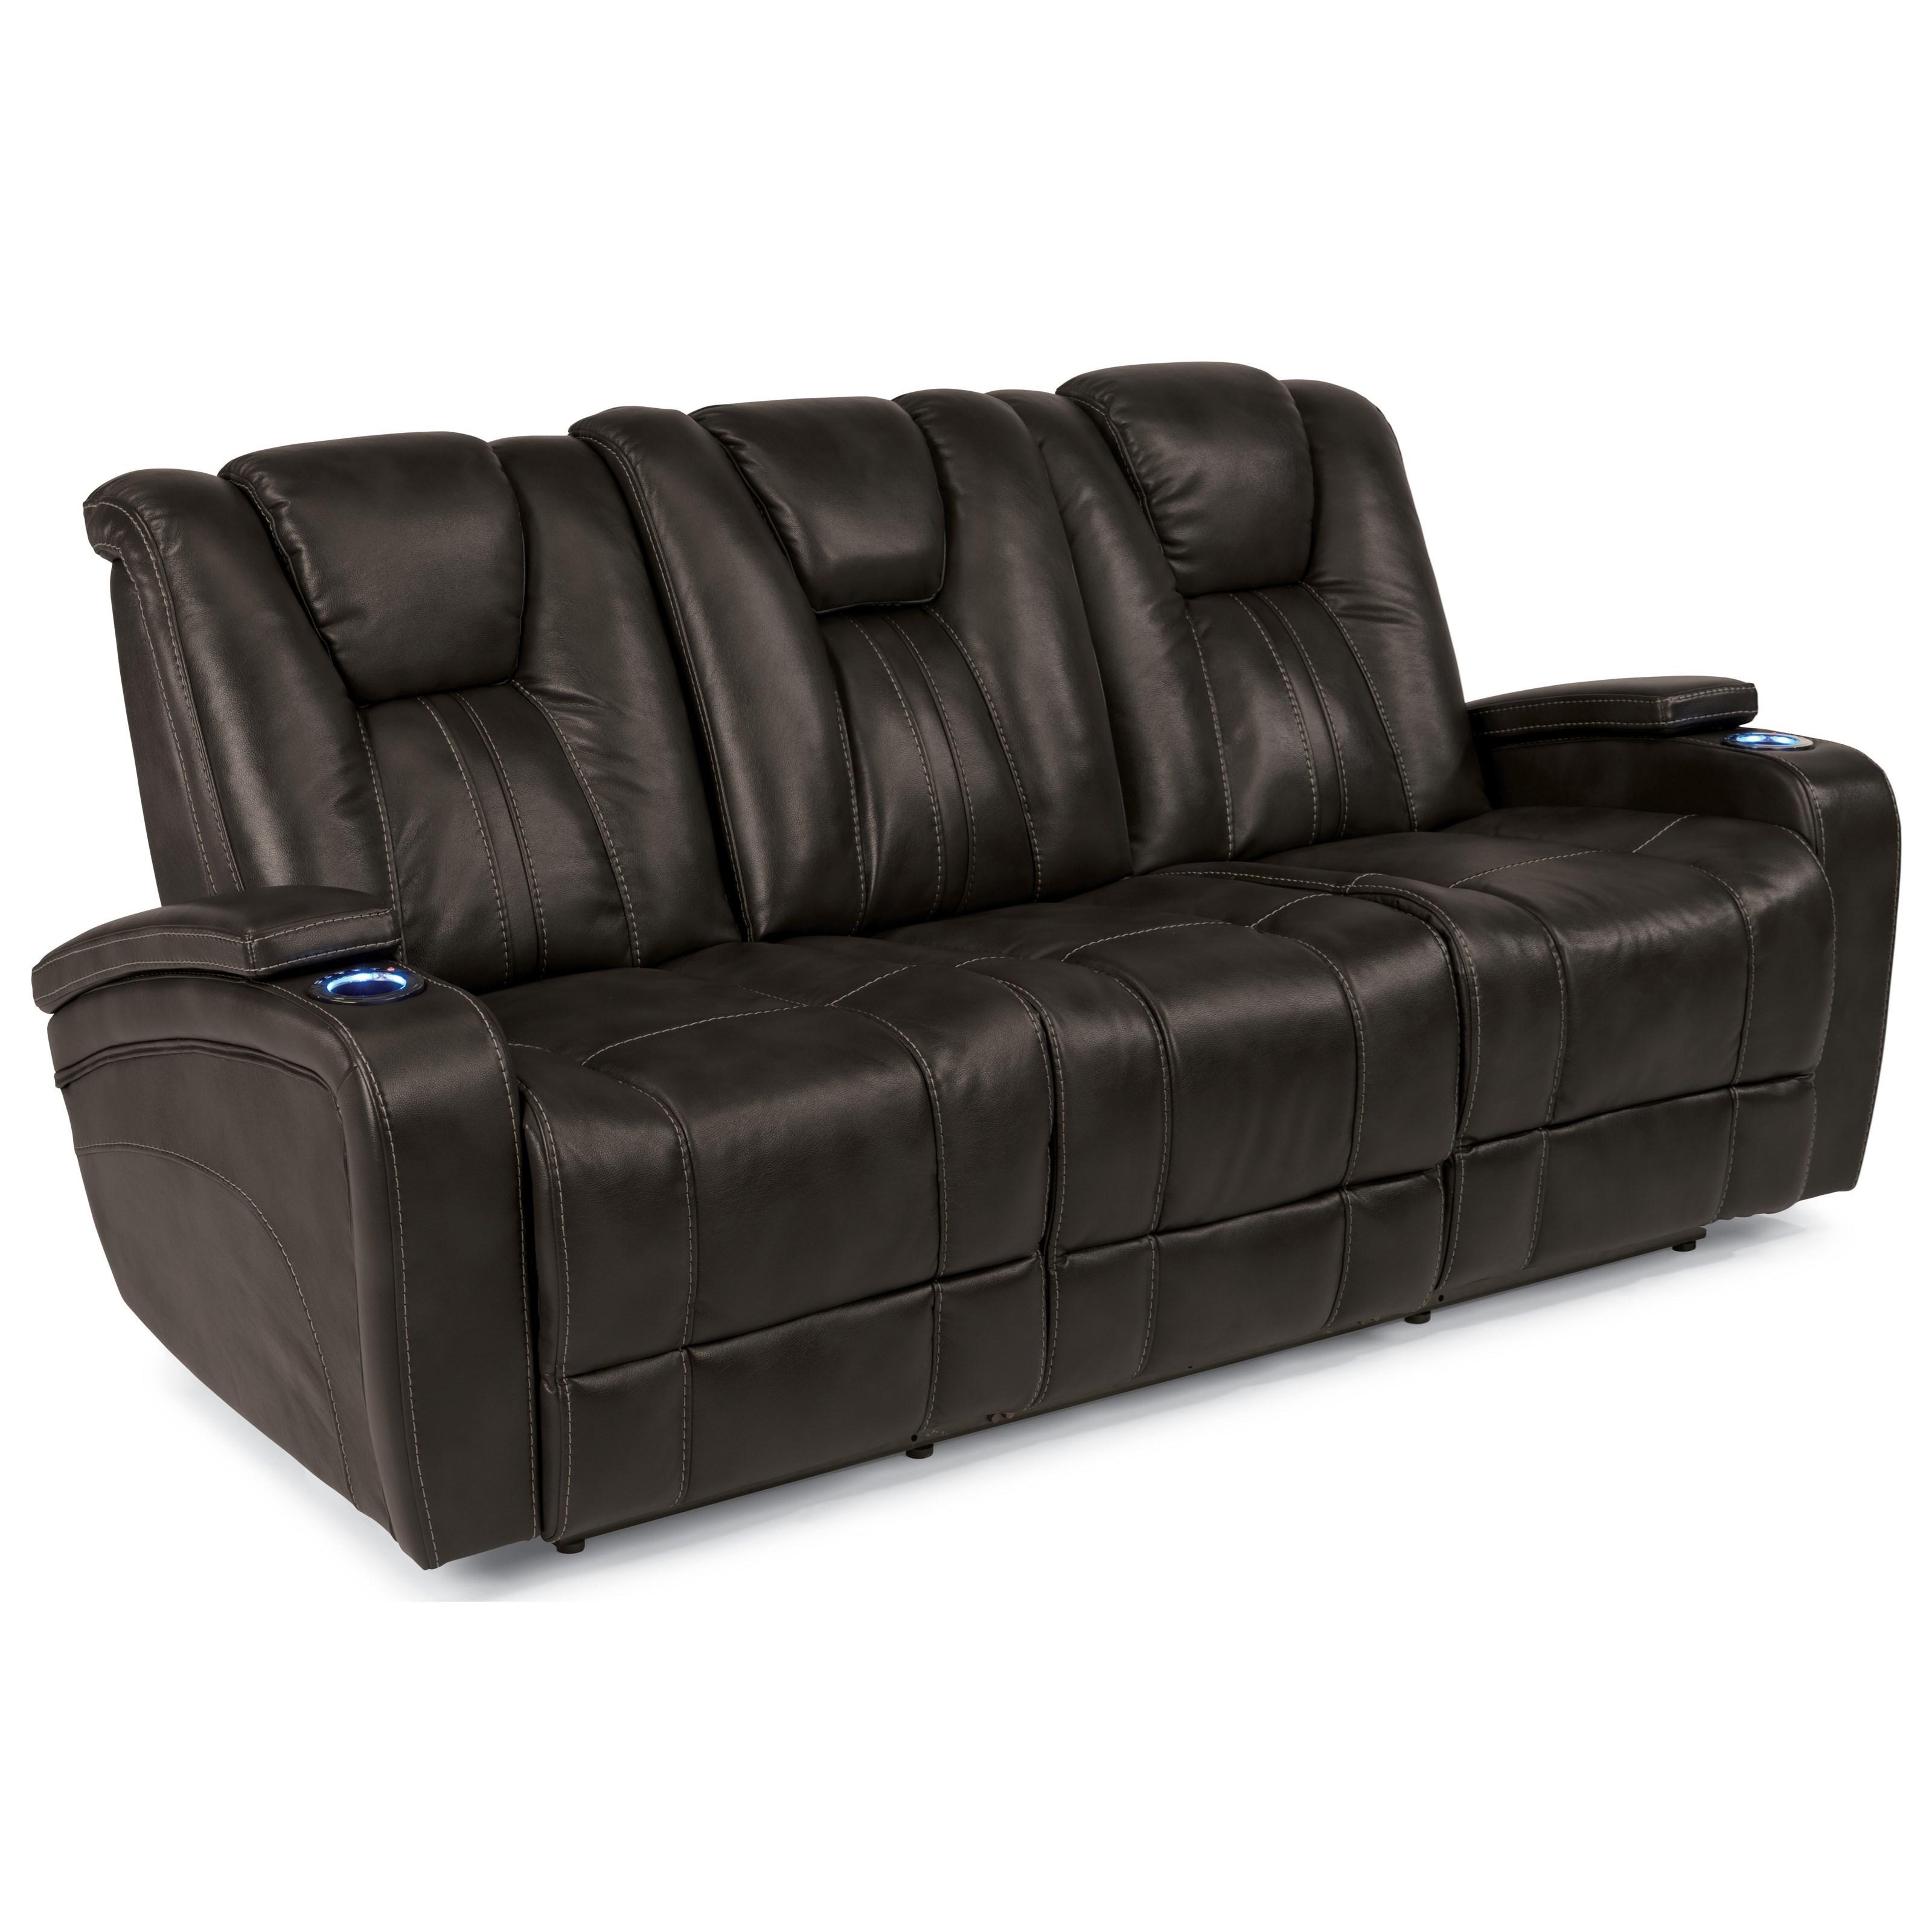 Flexsteel Latitudes-Trinidad Power Reclining Sofa - Item Number: 1642-62P 02